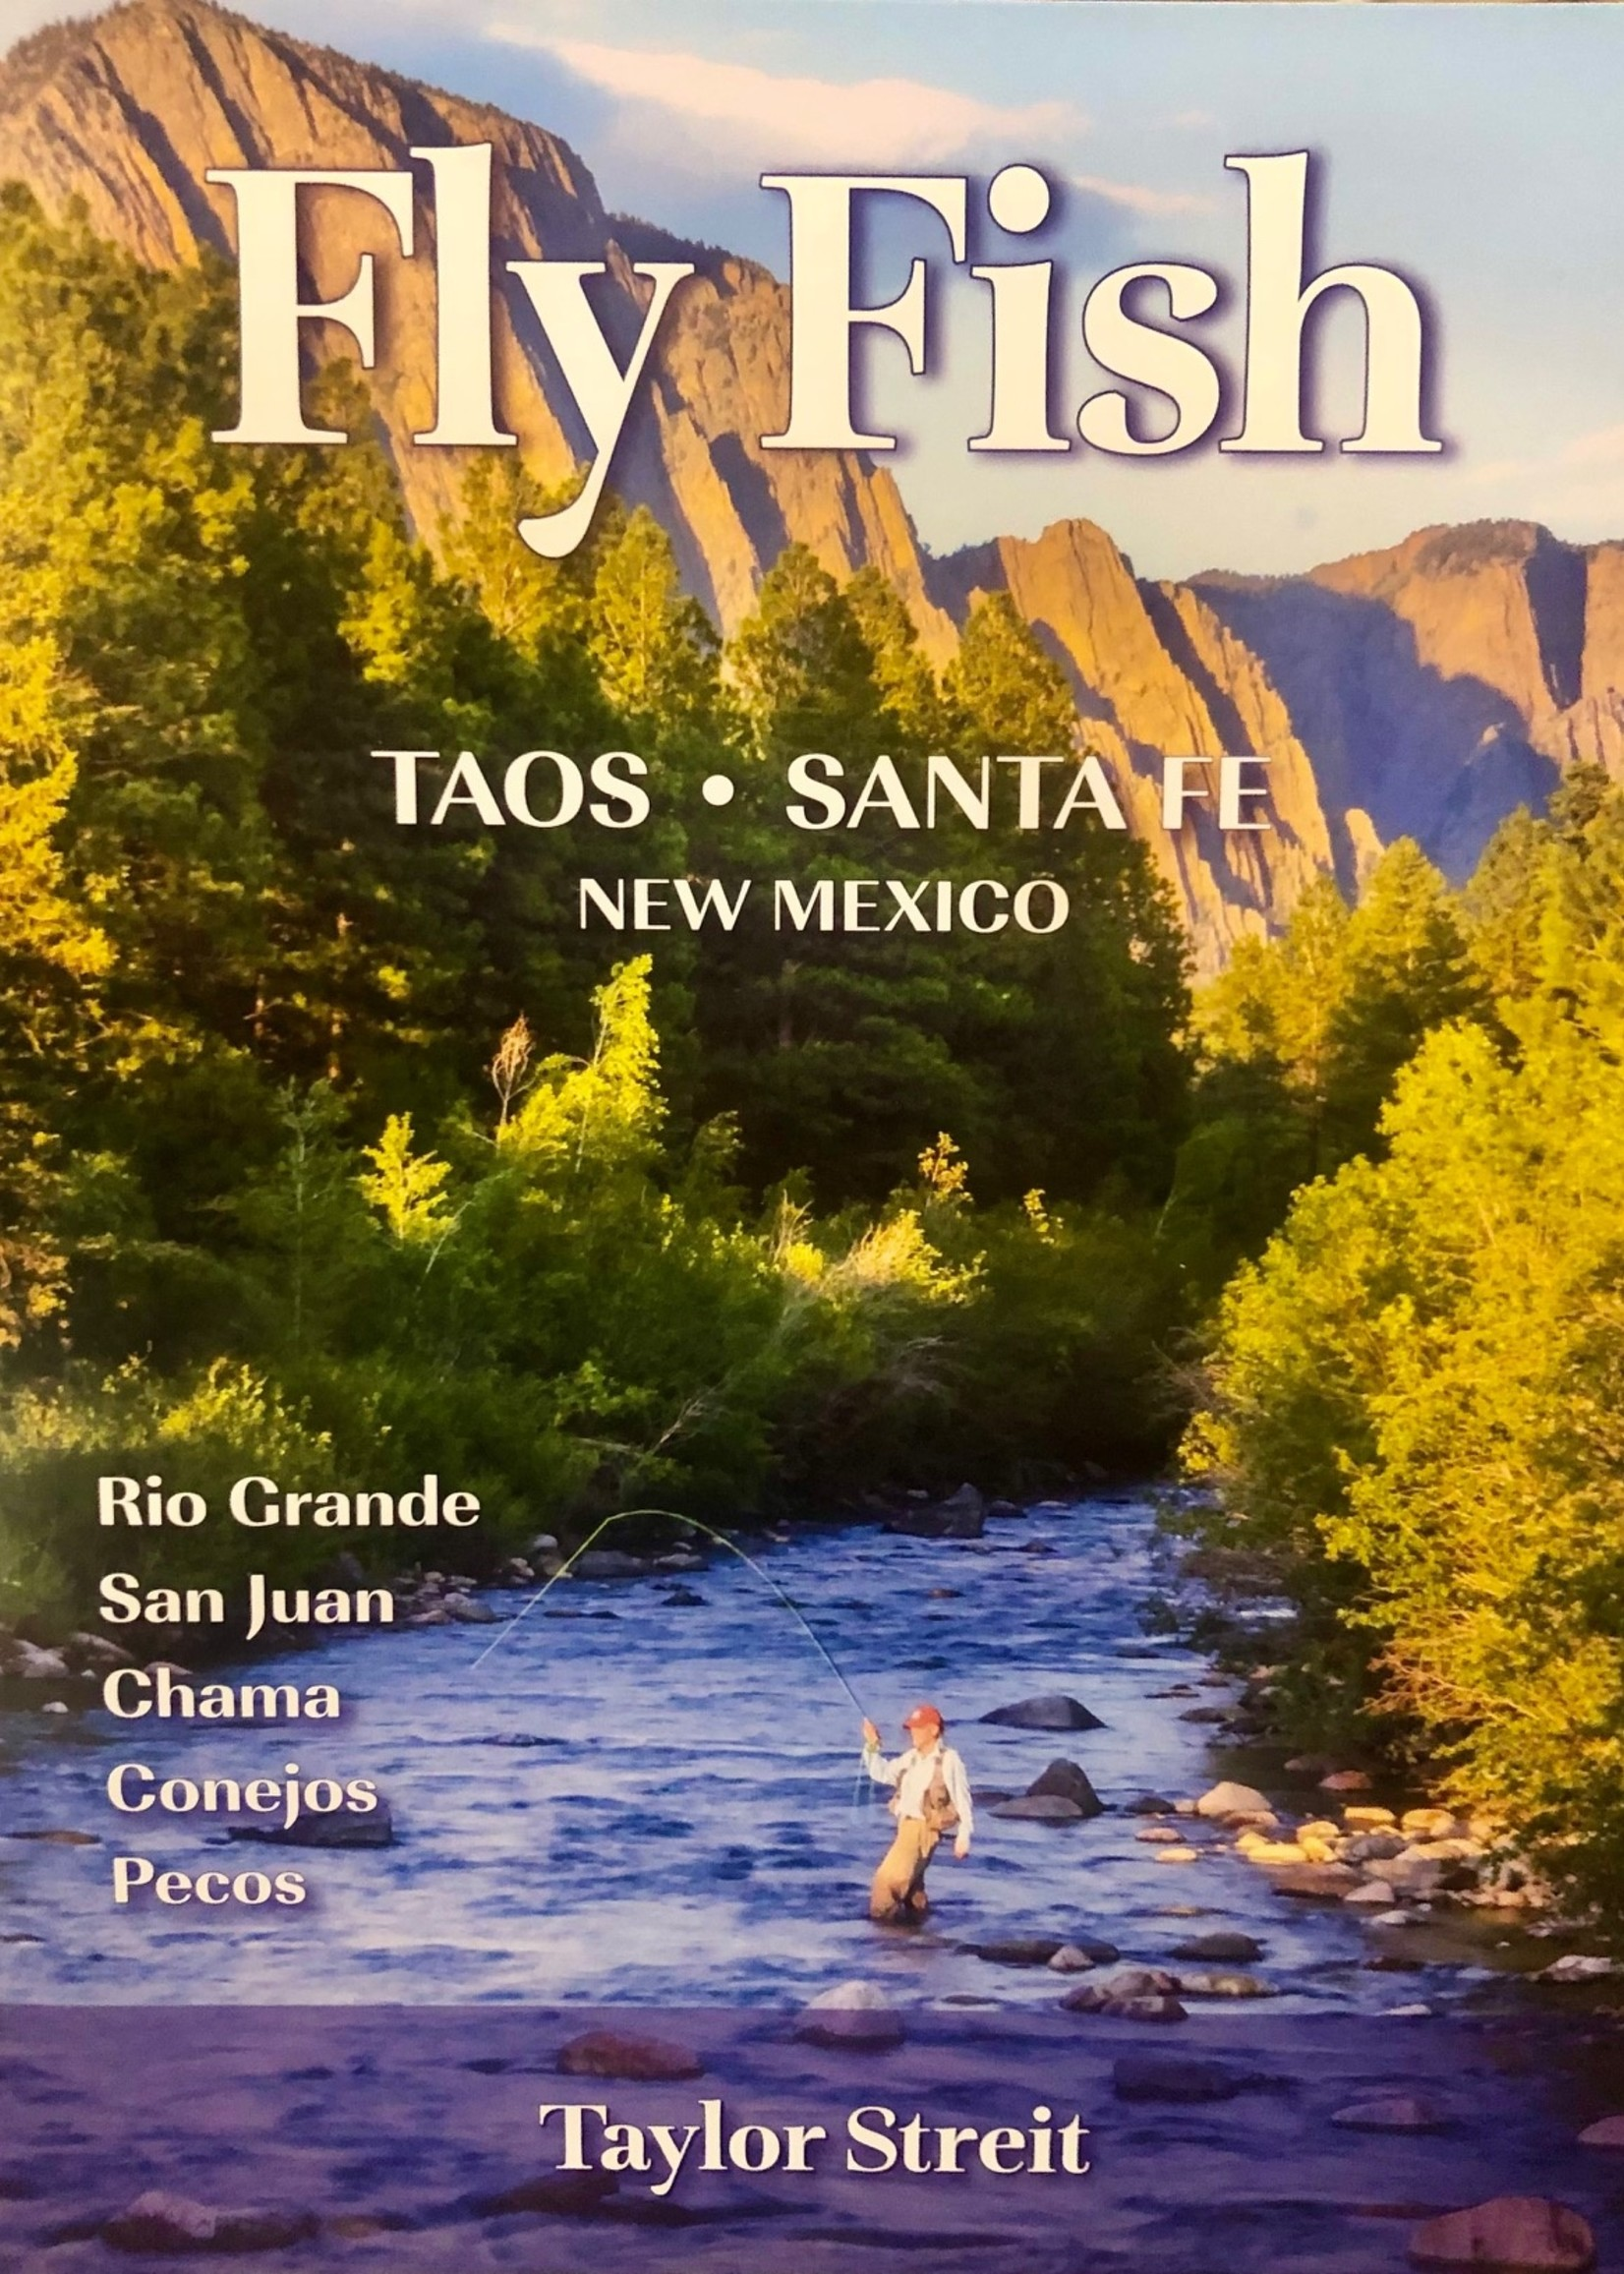 THE REEL LIFE Fly Fish Taos/Santa Fe by Taylor Streit